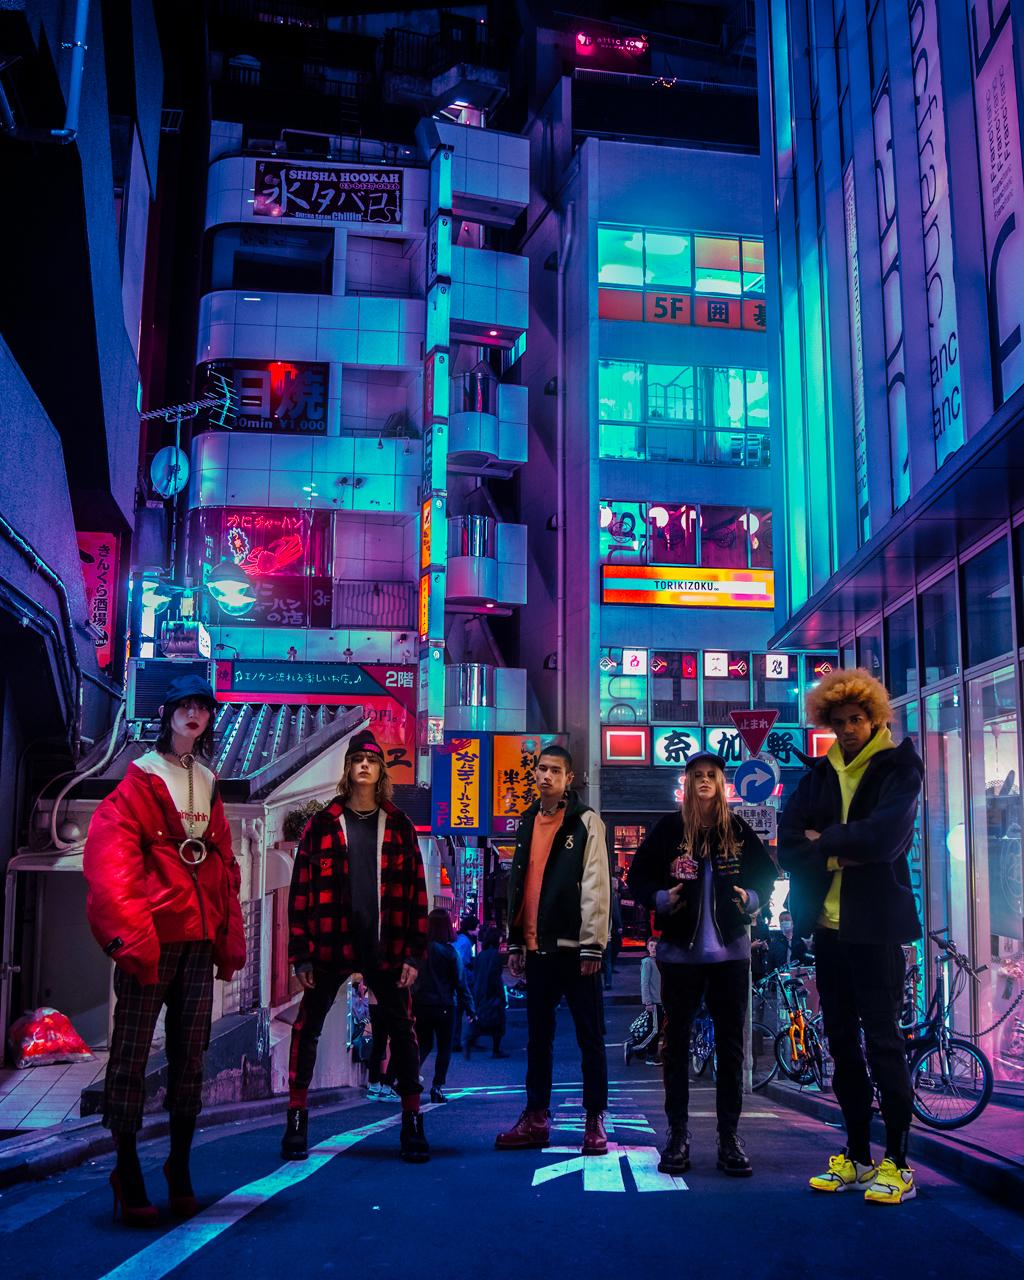 4k Resolution Neon Wallpaper Hd Japan Neon Lights Wallpaper